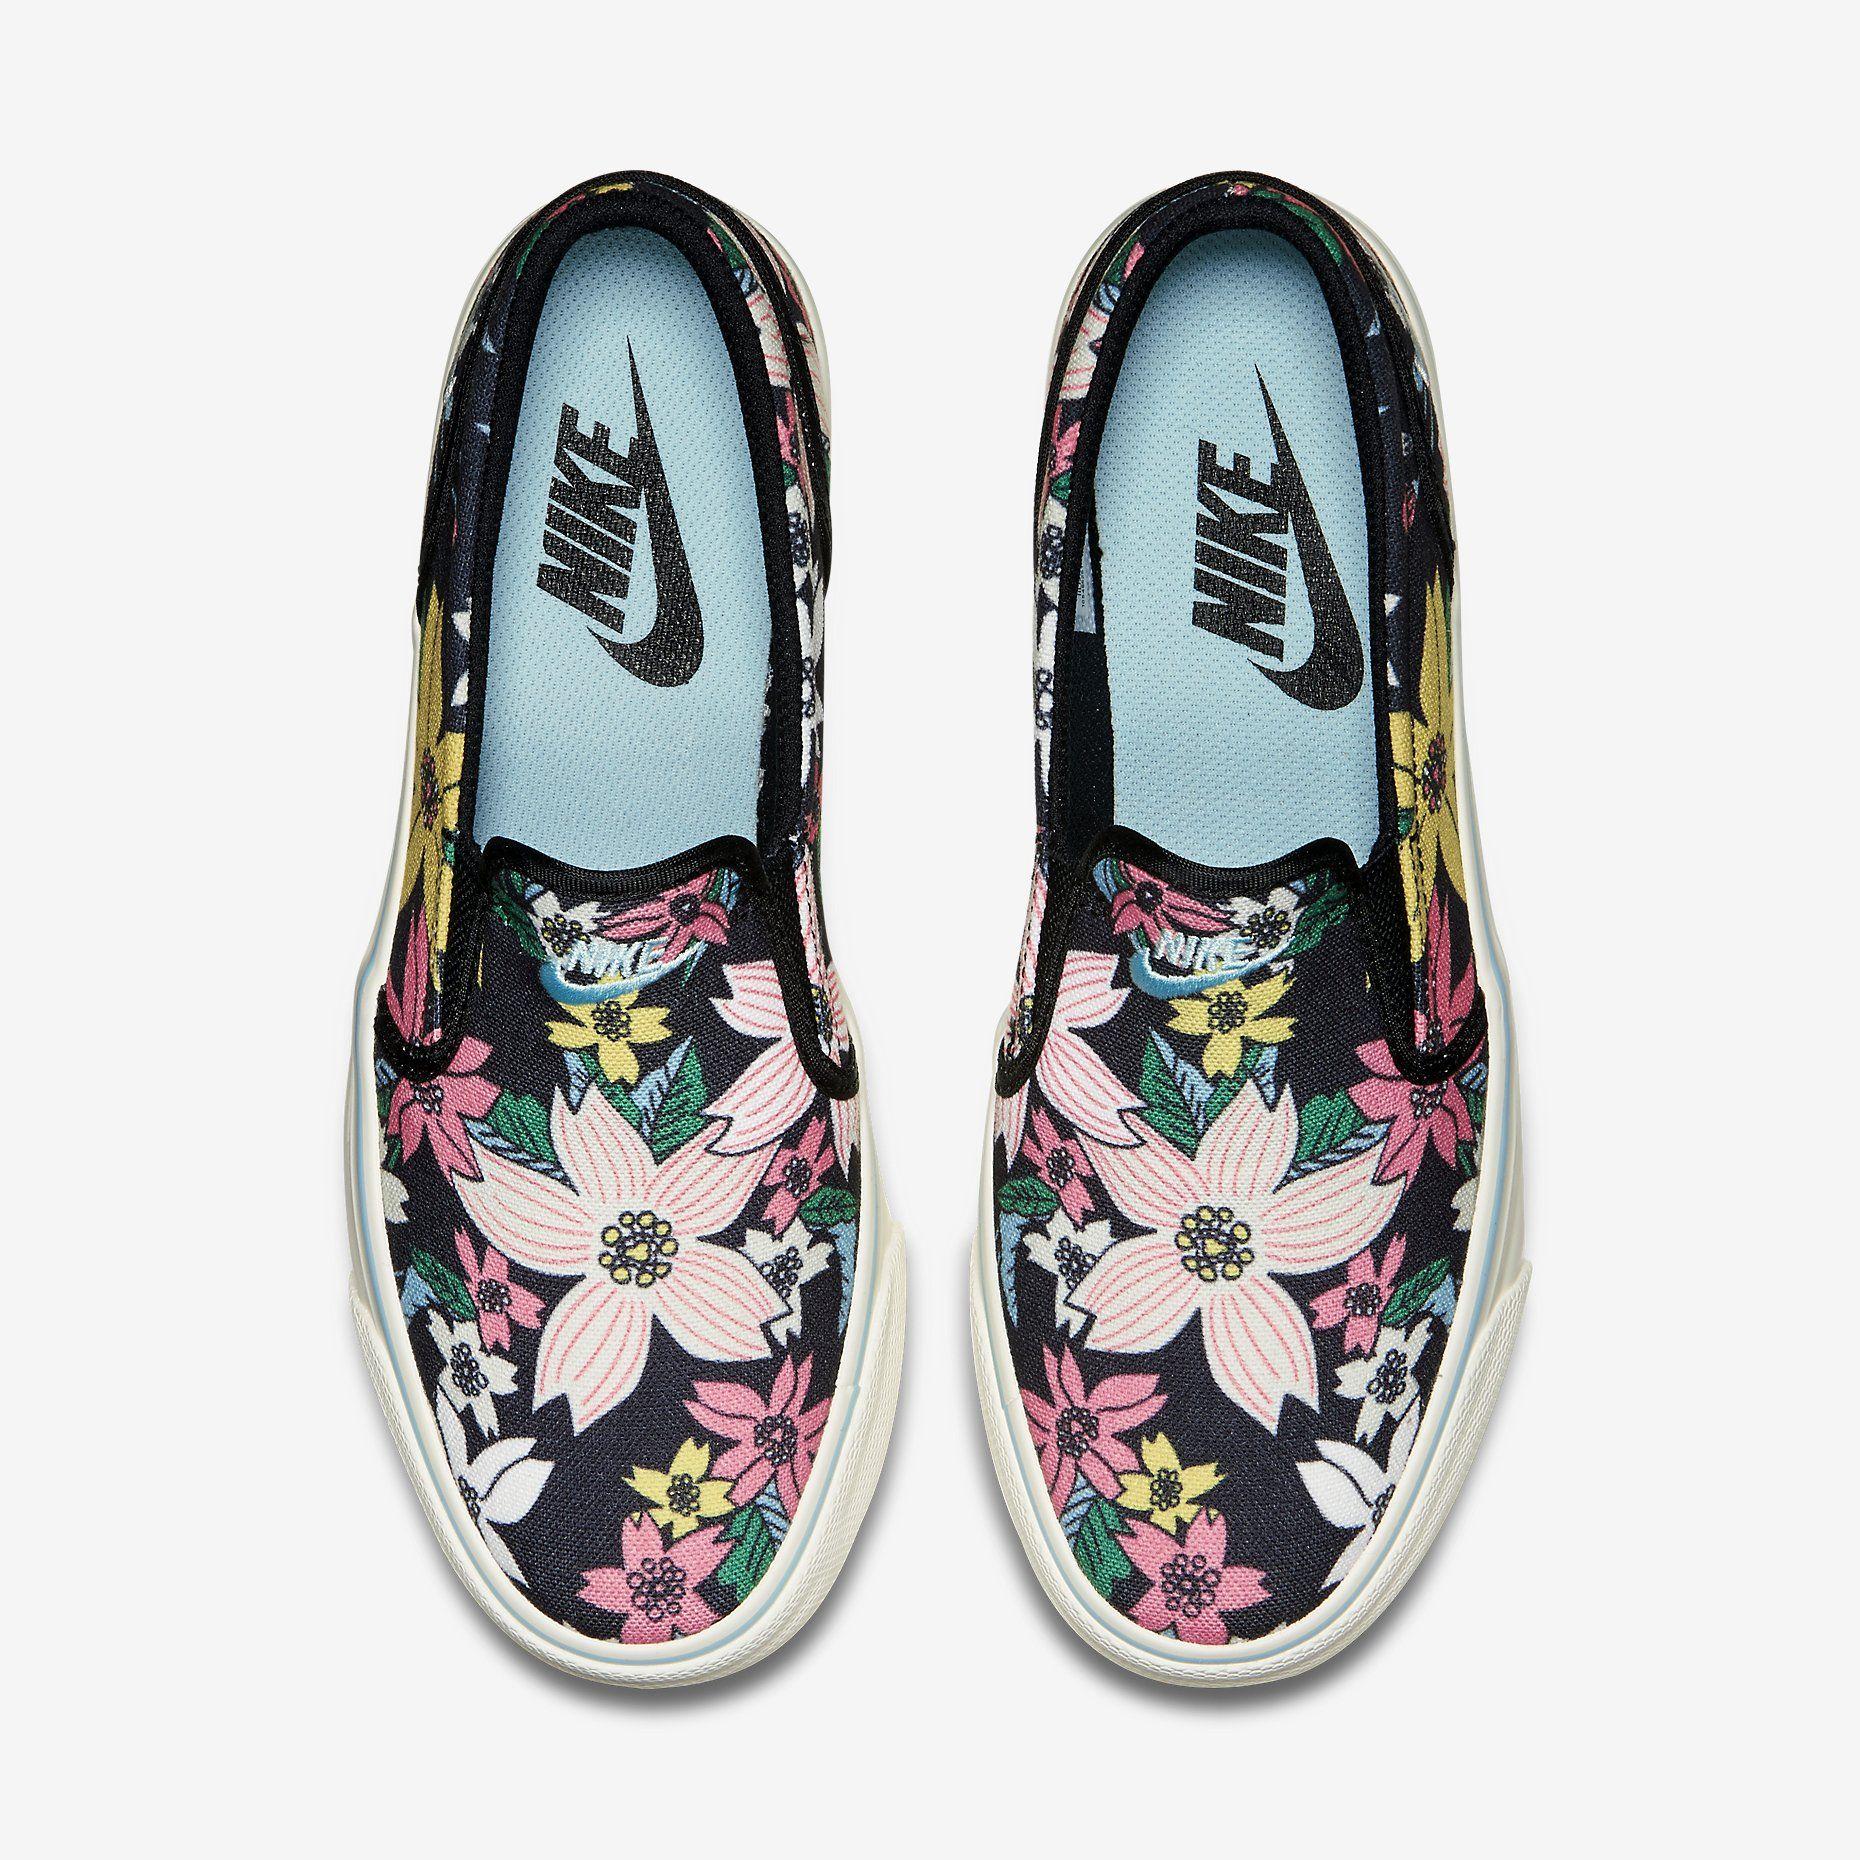 61378c4cf77f ... Roshe Run Womens Dark Blue White Mesh shoes. Nike Toki Slip-On Print  Canvas Women s Shoe. Nike Store